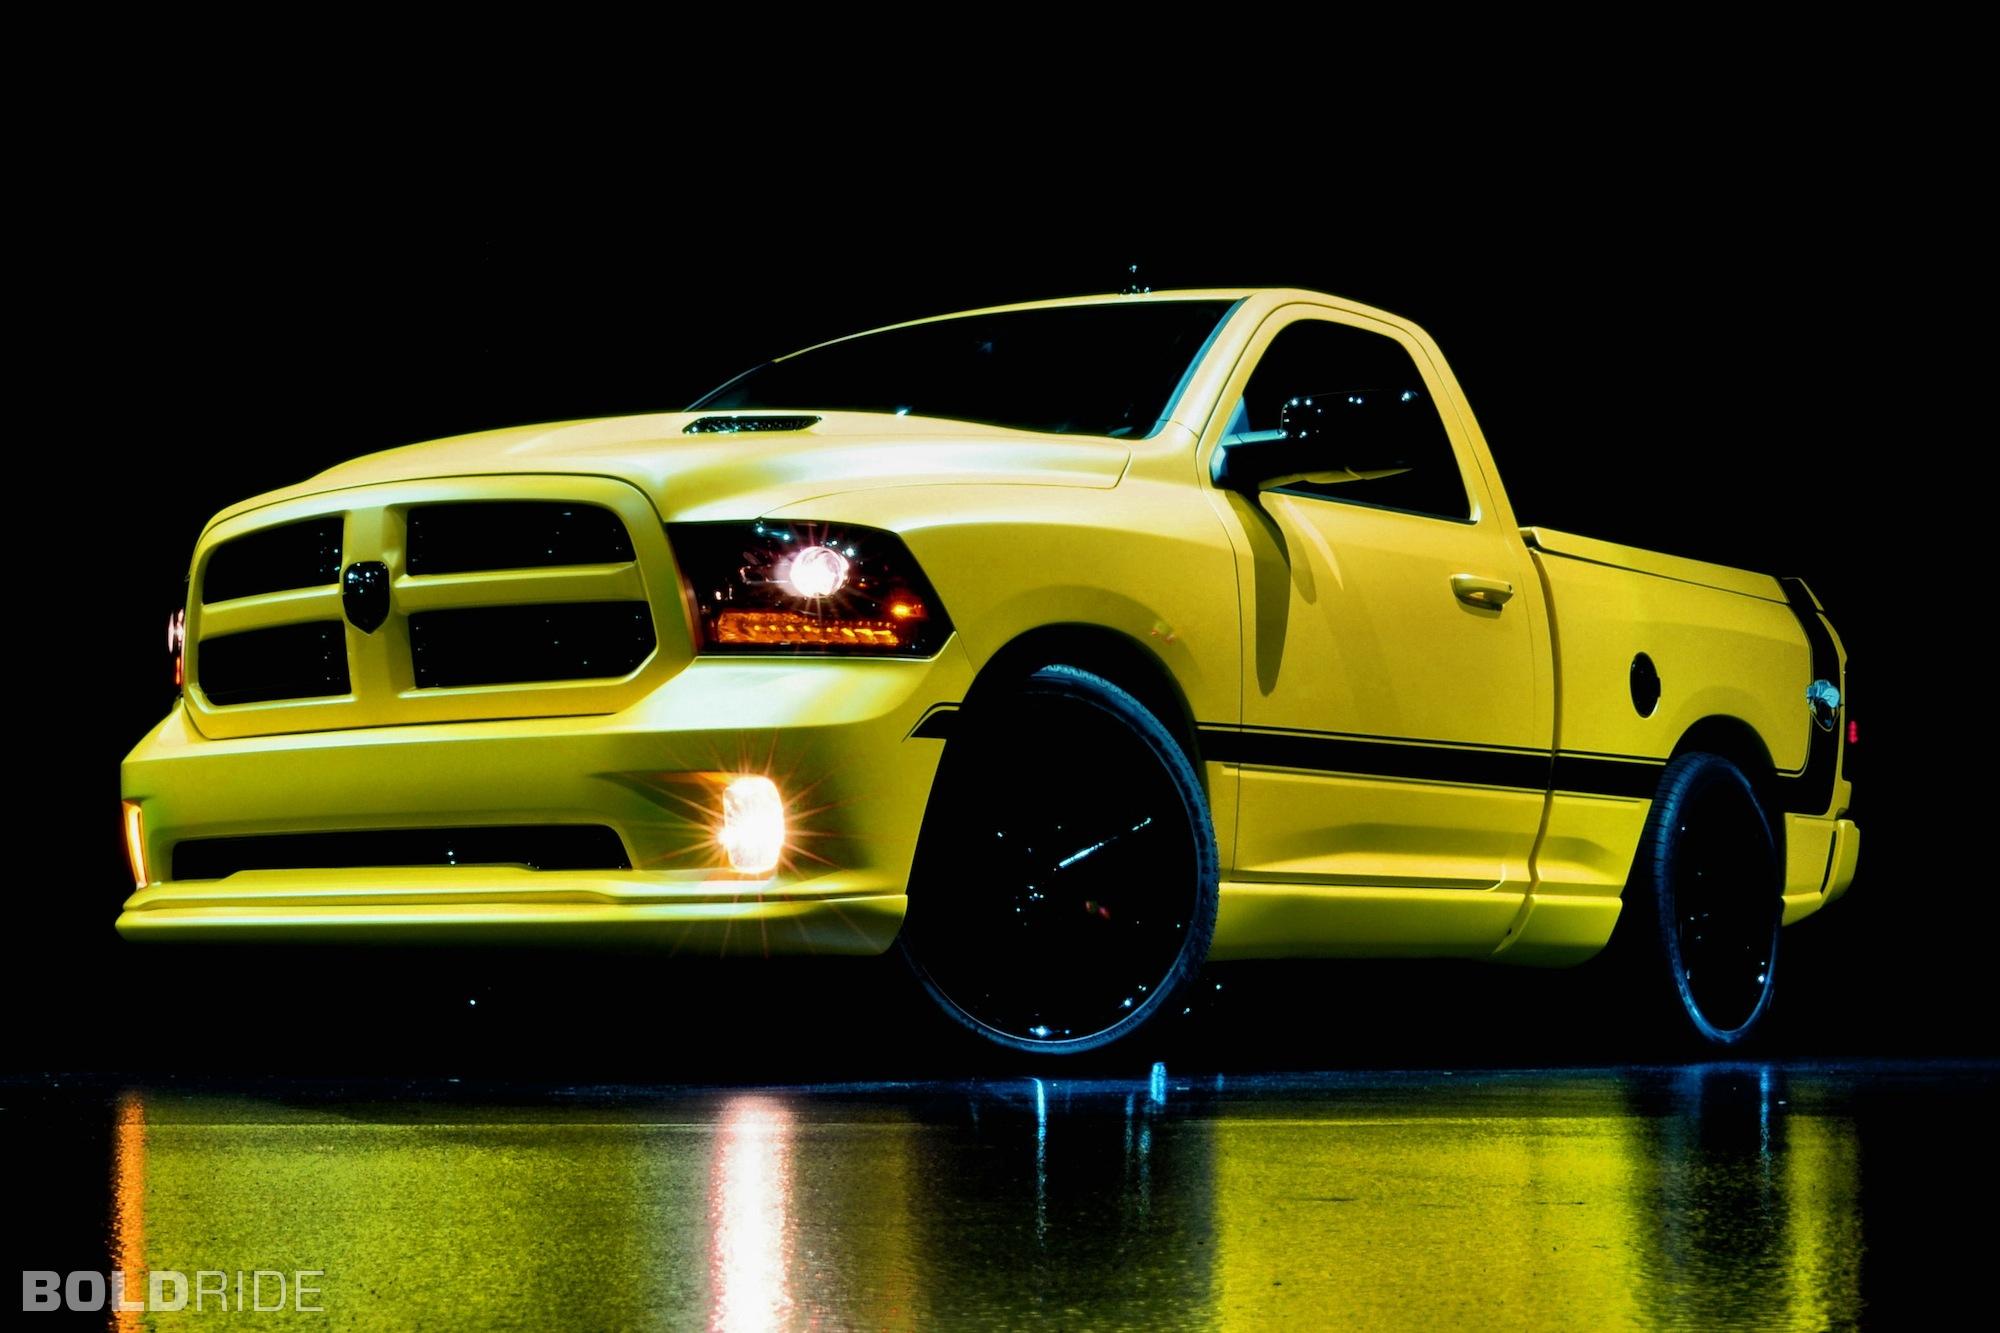 Dodge Ram Trucks HD Wallpapers Backgrounds Wallpaper 2000x1333 2000x1333